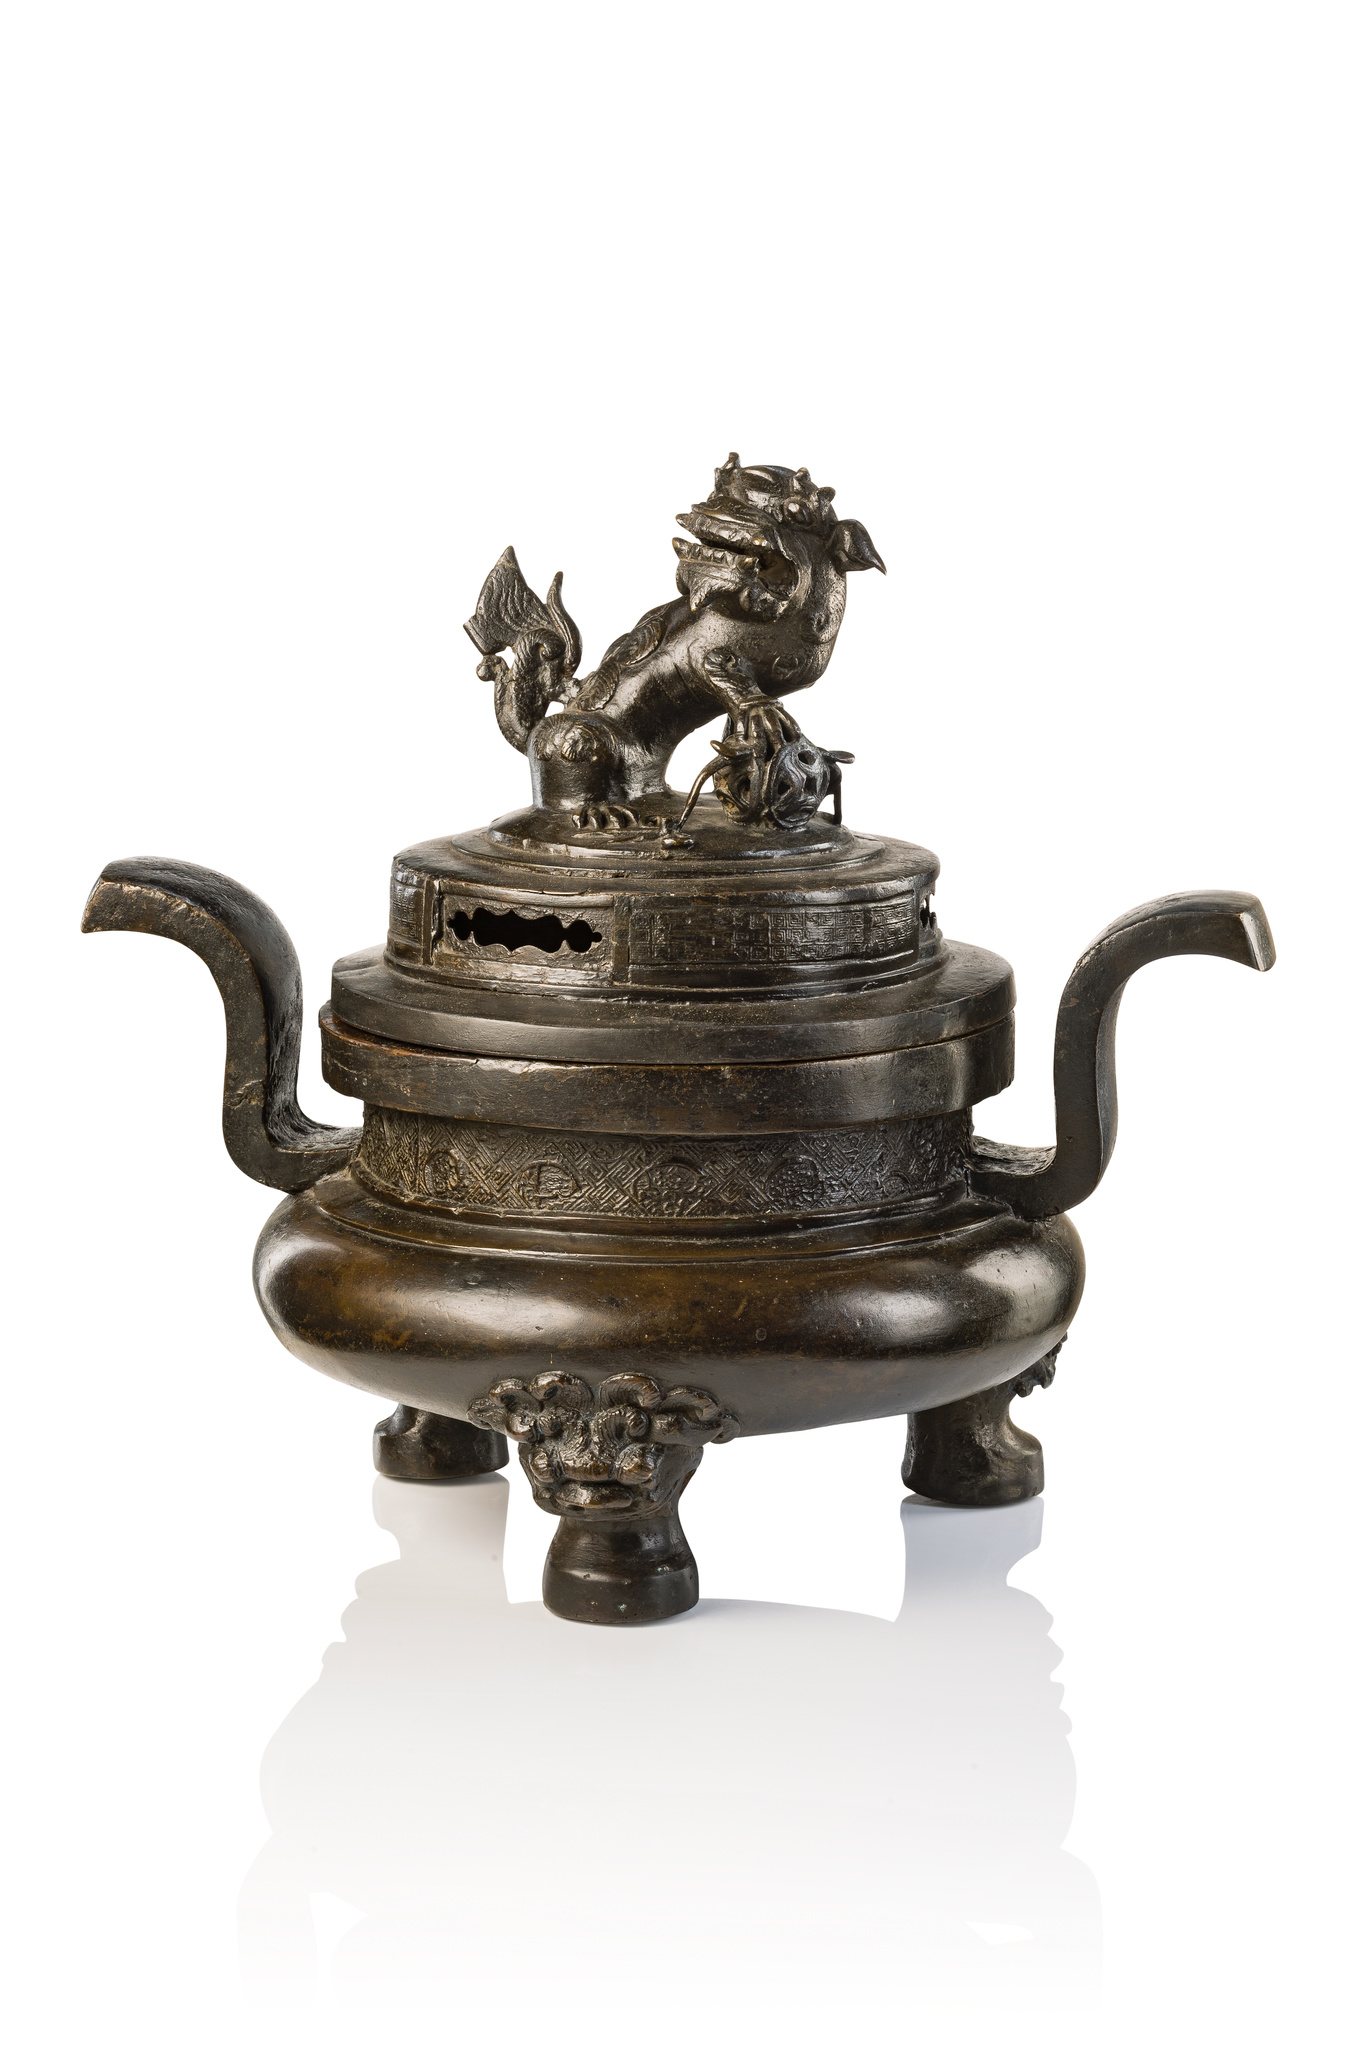 Räuchergefäß, späte Ming-Zeit, 17. Jahrhundert